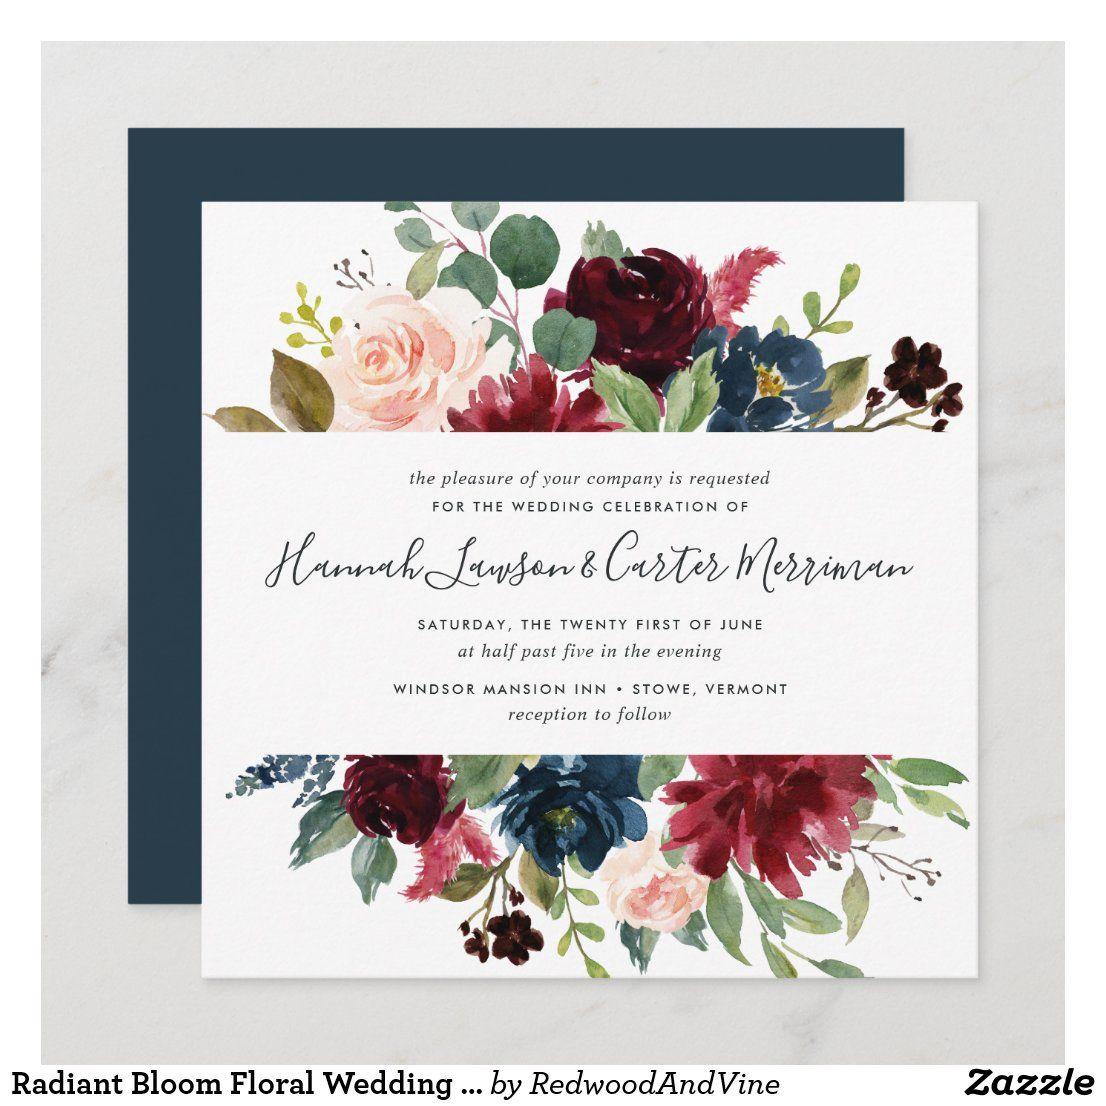 Radiant Bloom Floral Wedding Invitation Square Zazzle Com In 2021 Floral Wedding Invitations Wedding Invitations Floral Wedding